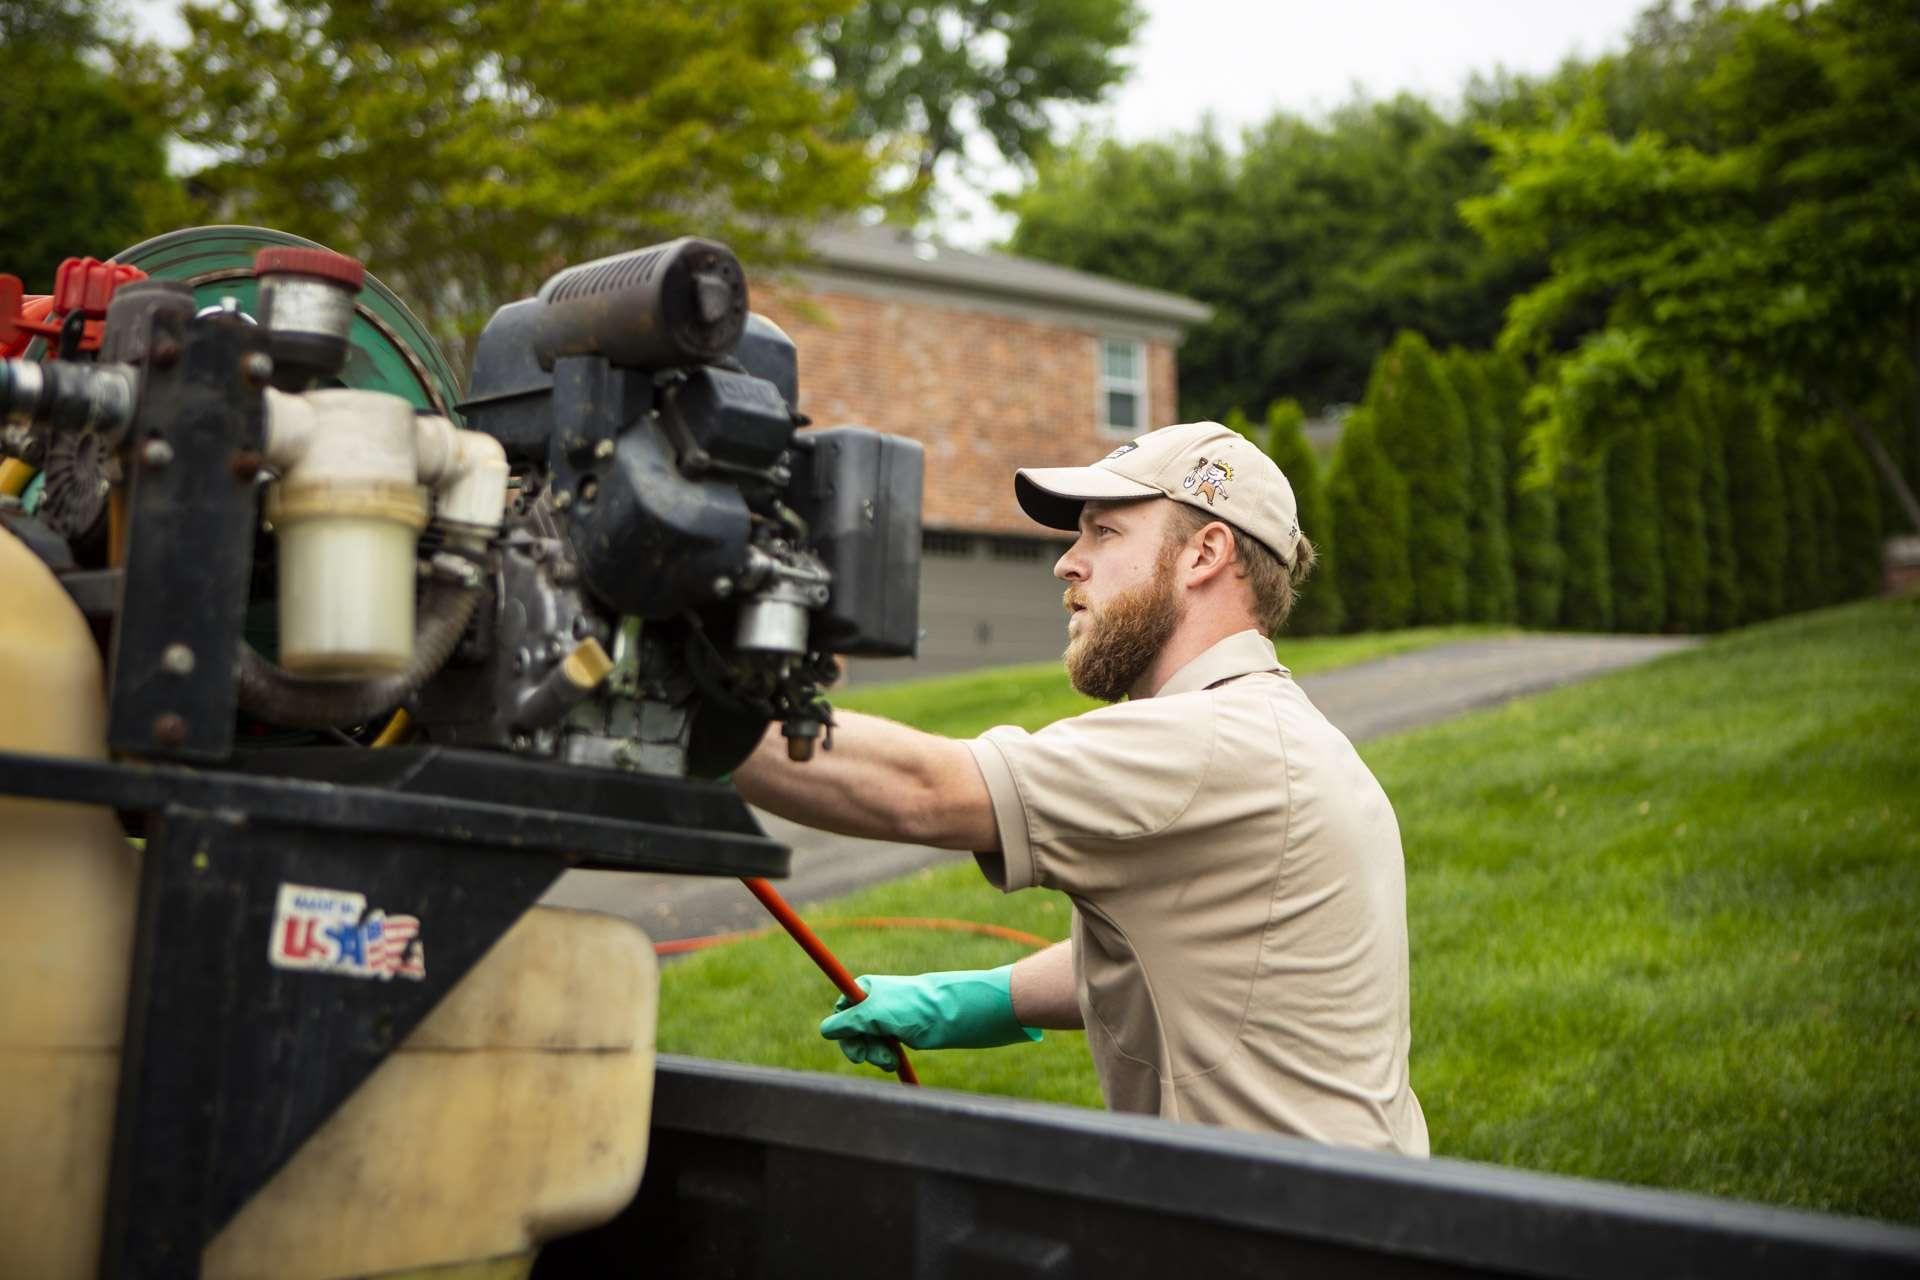 spraying-lawn-truck-crew